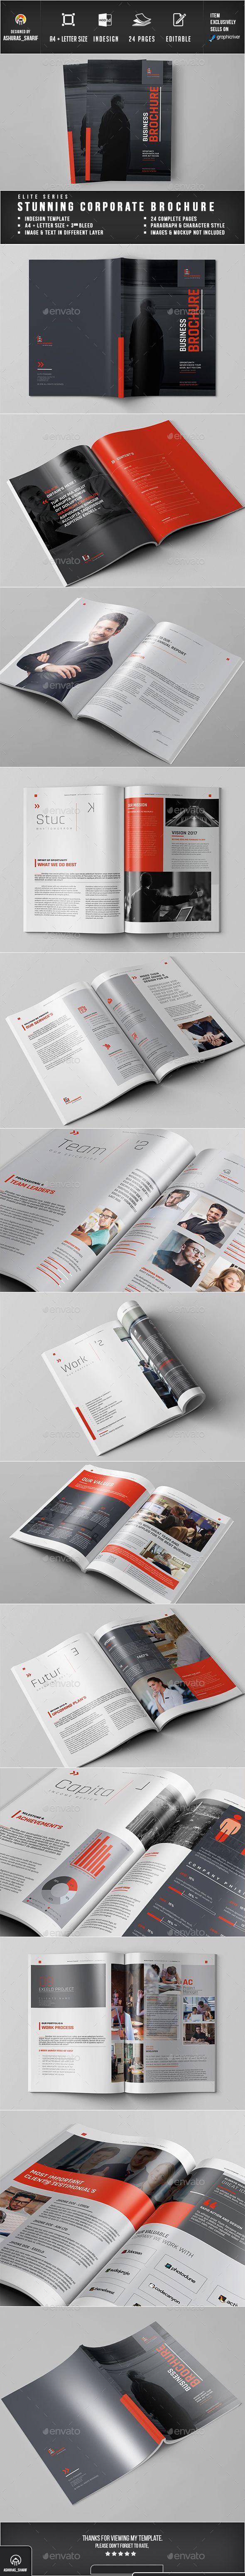 Brochure | Brochures, Brochure template and Company profile